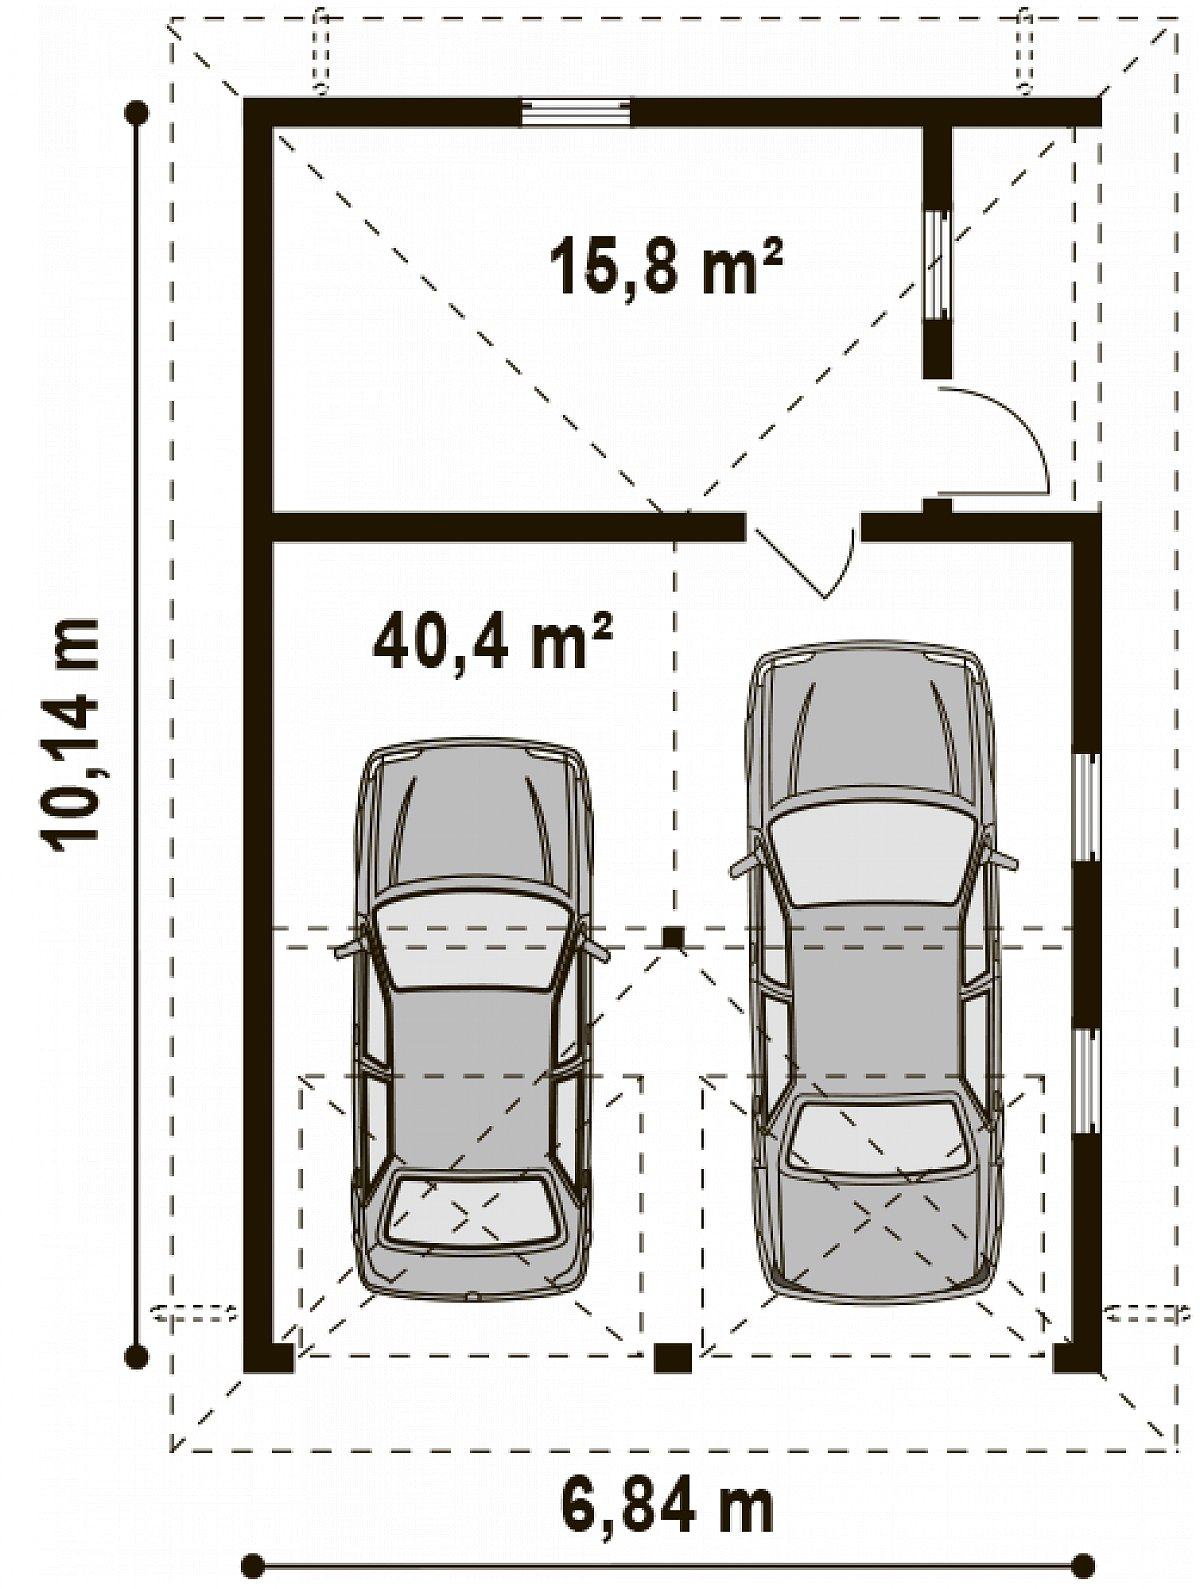 Площадь 56,2м² гаража Zg19